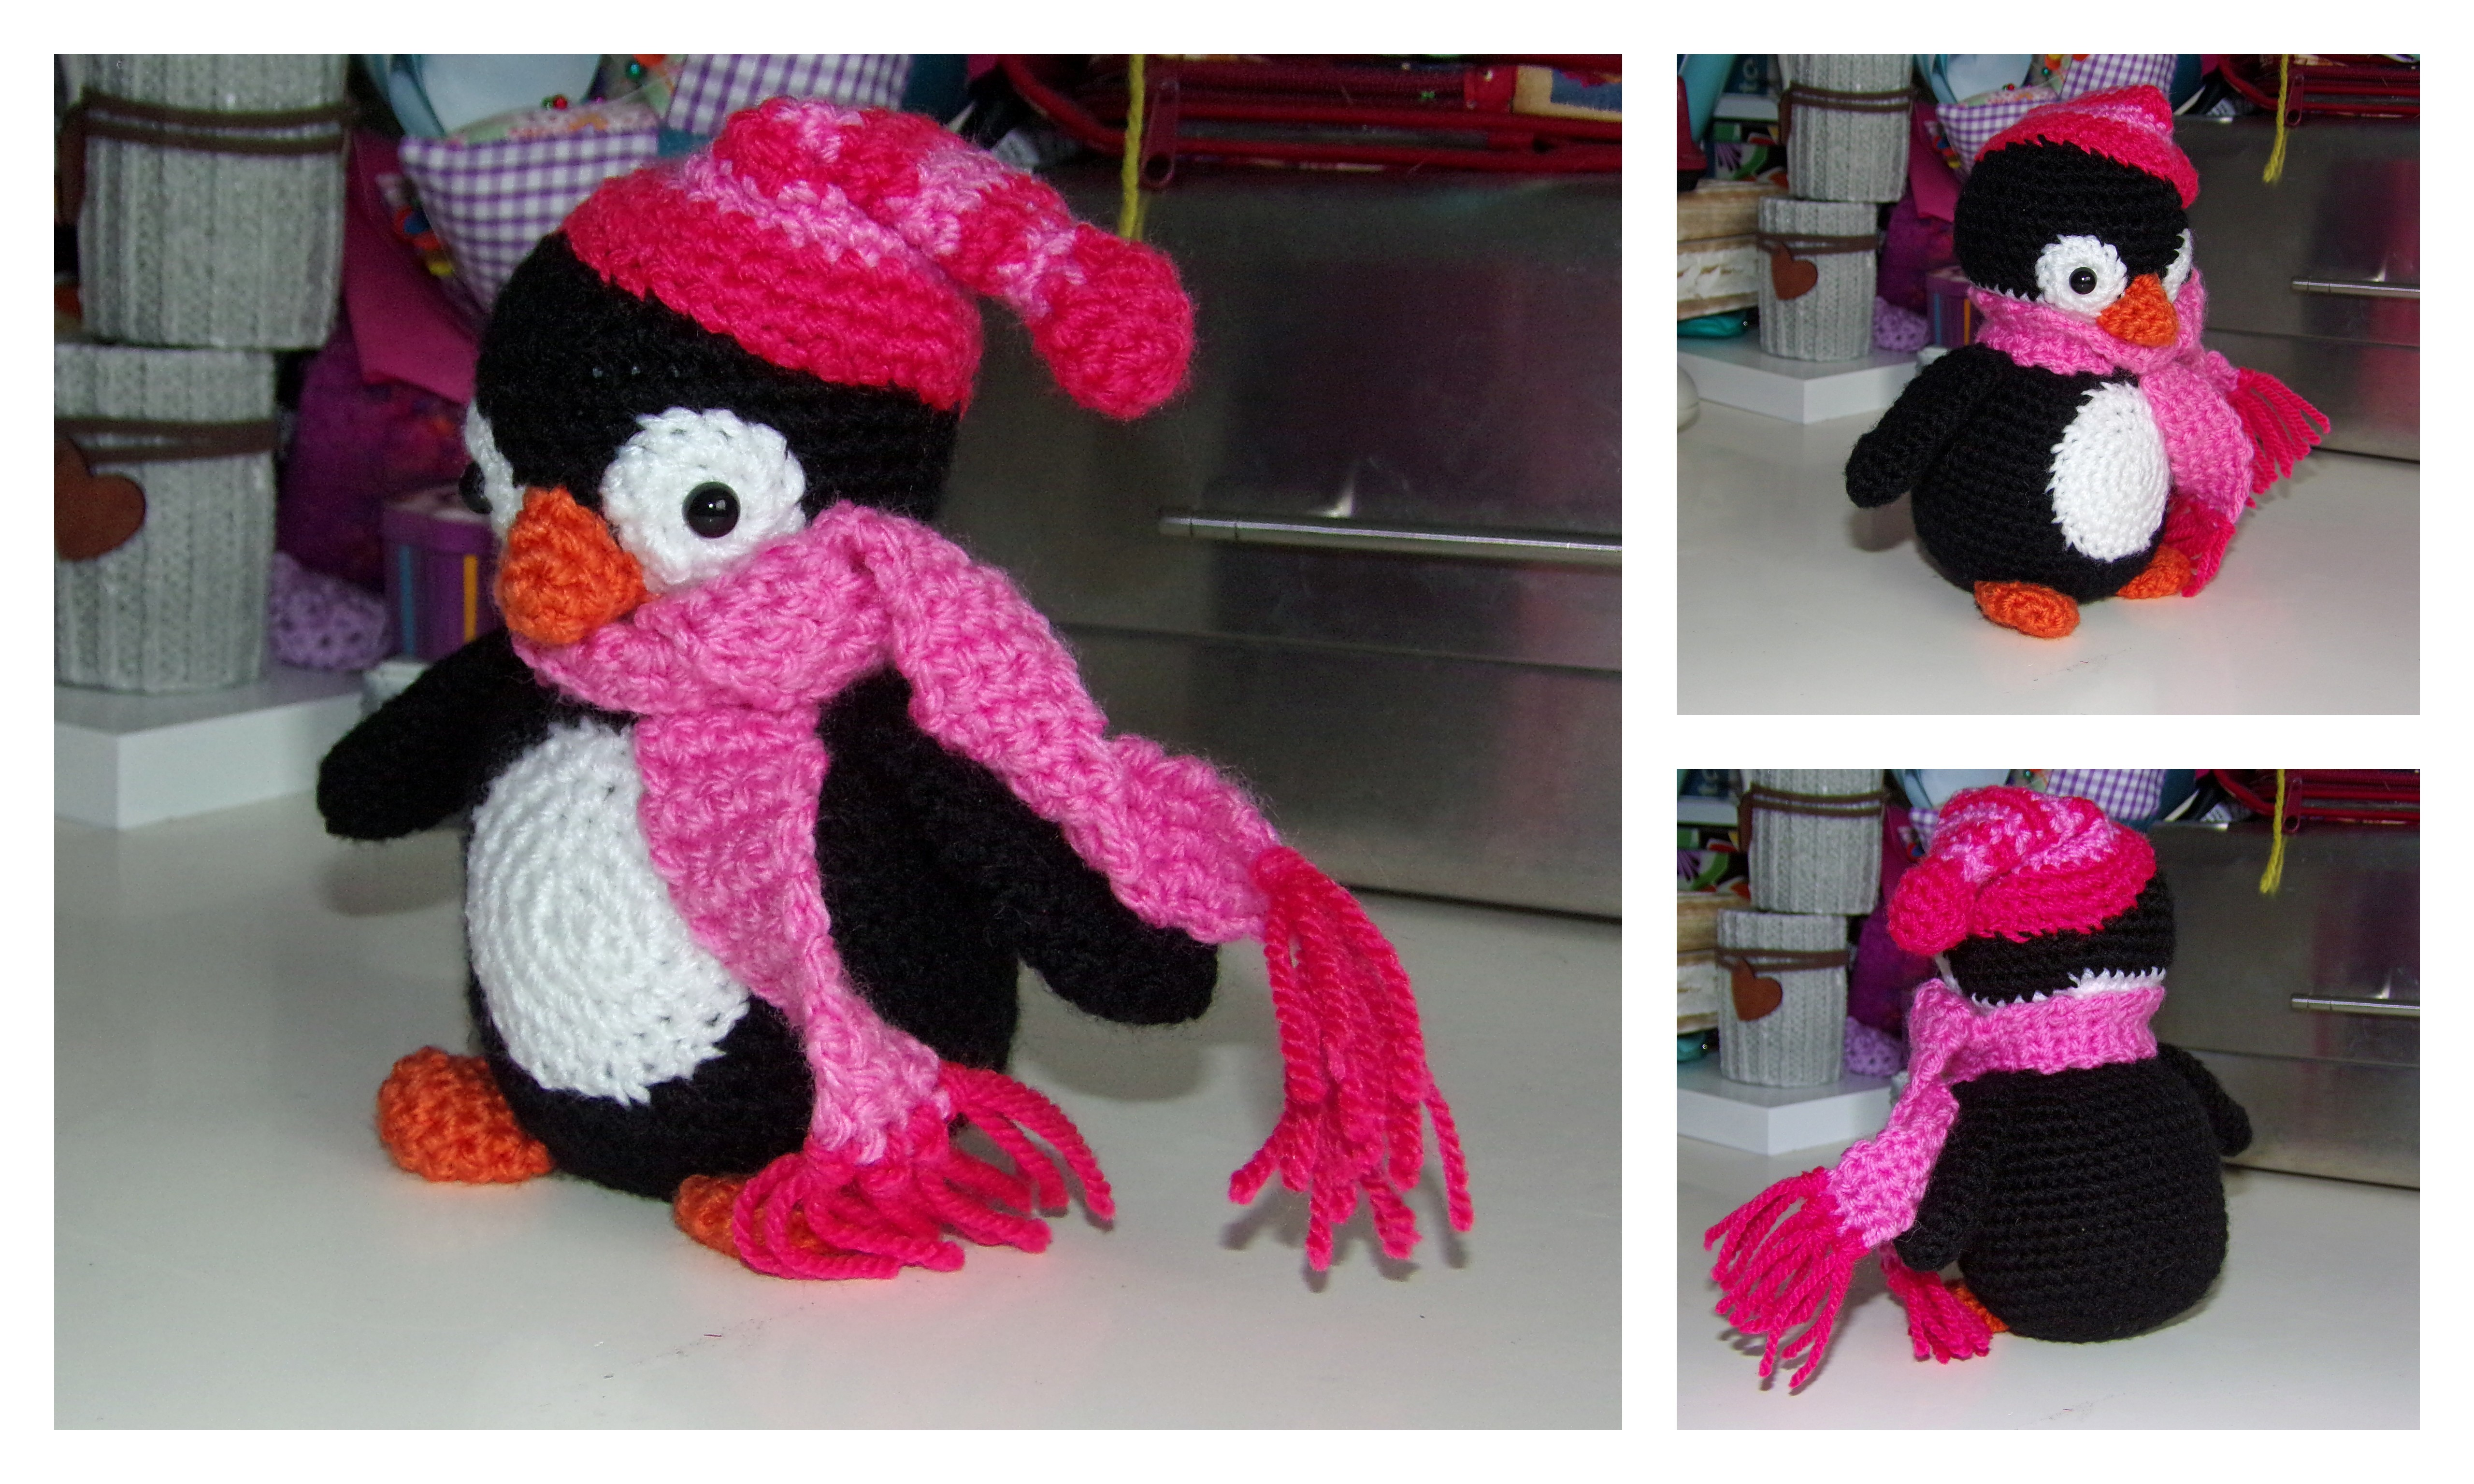 More crocheted amigurumi presents for kids the dragon ...